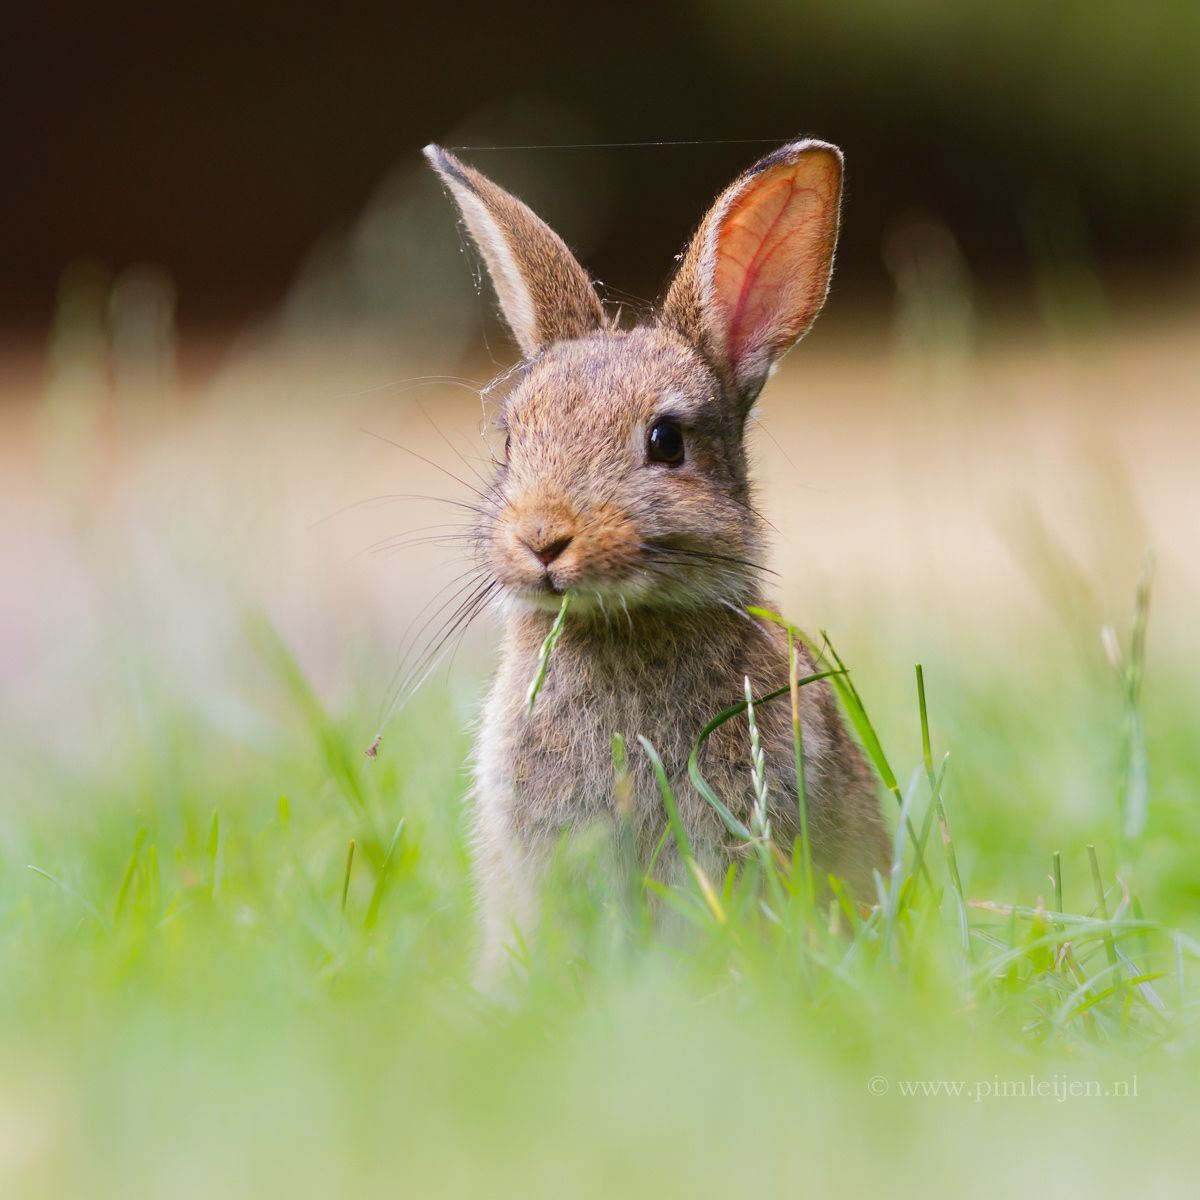 Cute Rabbit By Pim Leijen On 500px Criatura Y Conejos